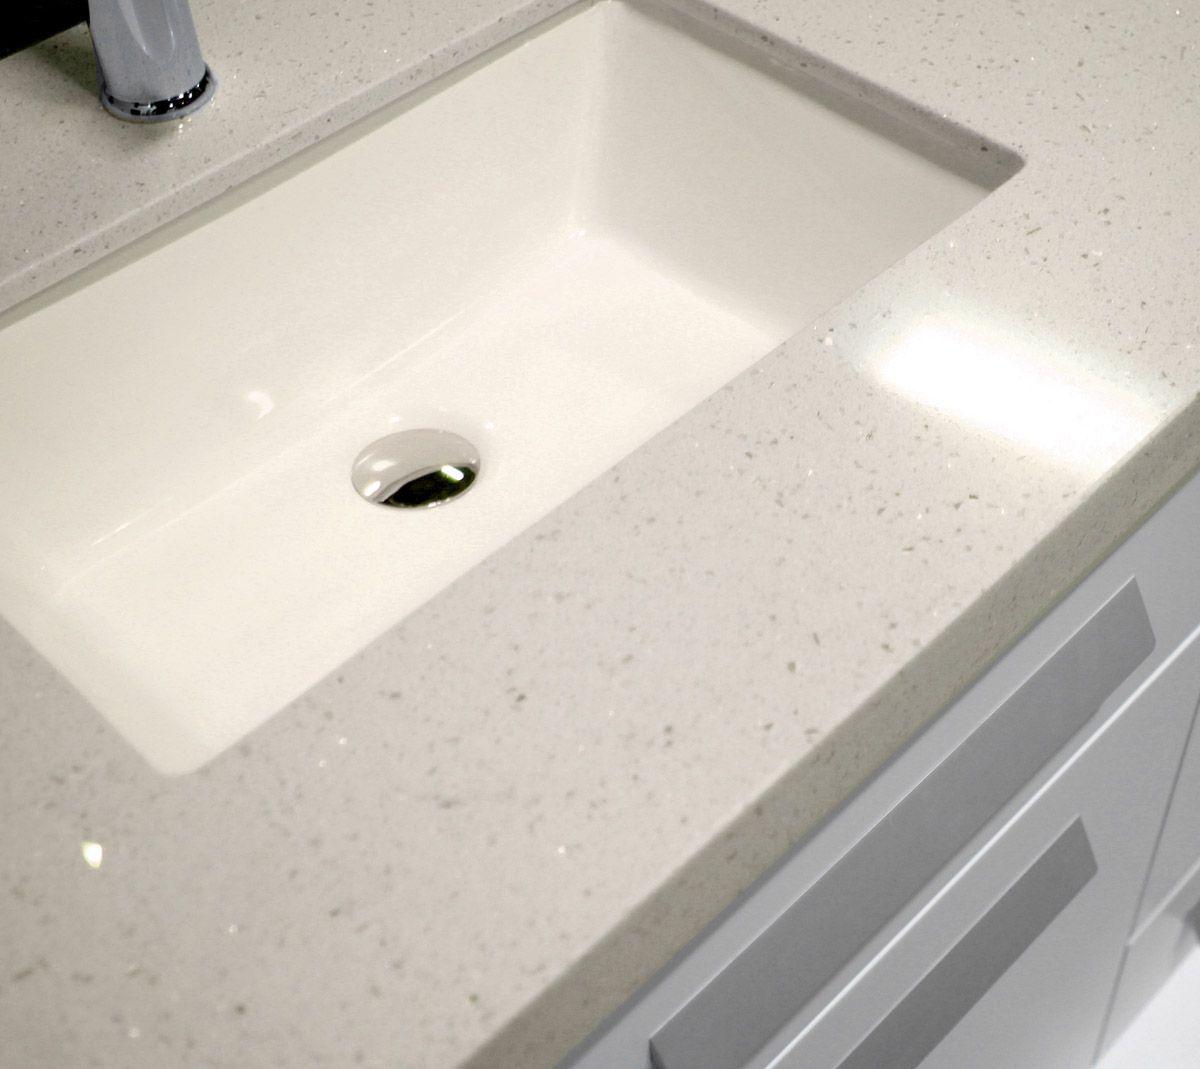 Off White Quartz Vanity Top Picks Up The Warm White Tones Of The